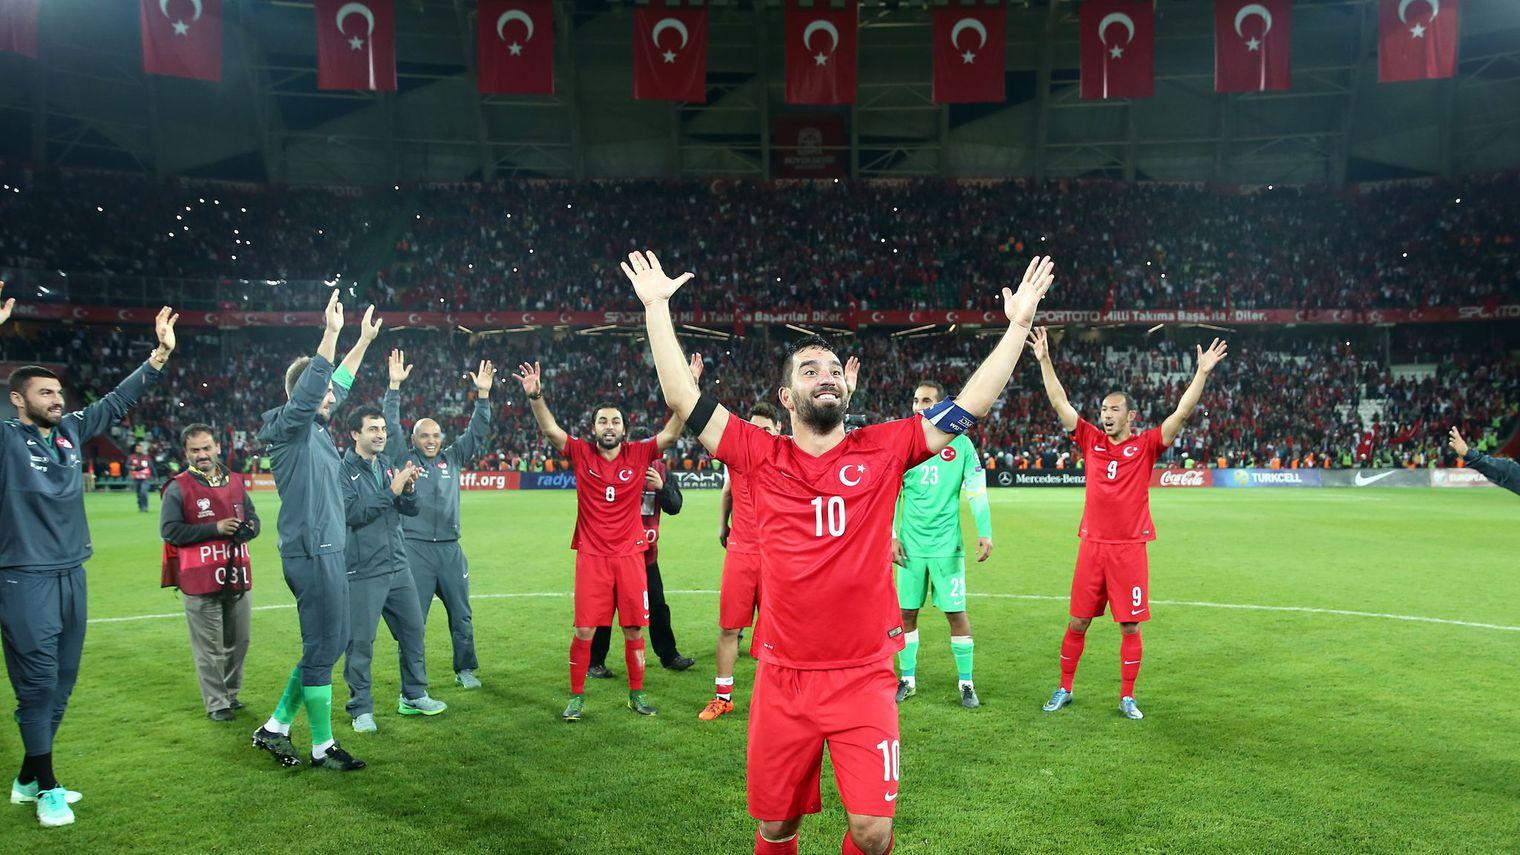 le-turc-arda-turan-fete-la-qualification-de-son-equipe-pour-l-euro-2016-apres-la-victoire-contre-l-islande-le-13-octobre-2015-a-konya_5445143